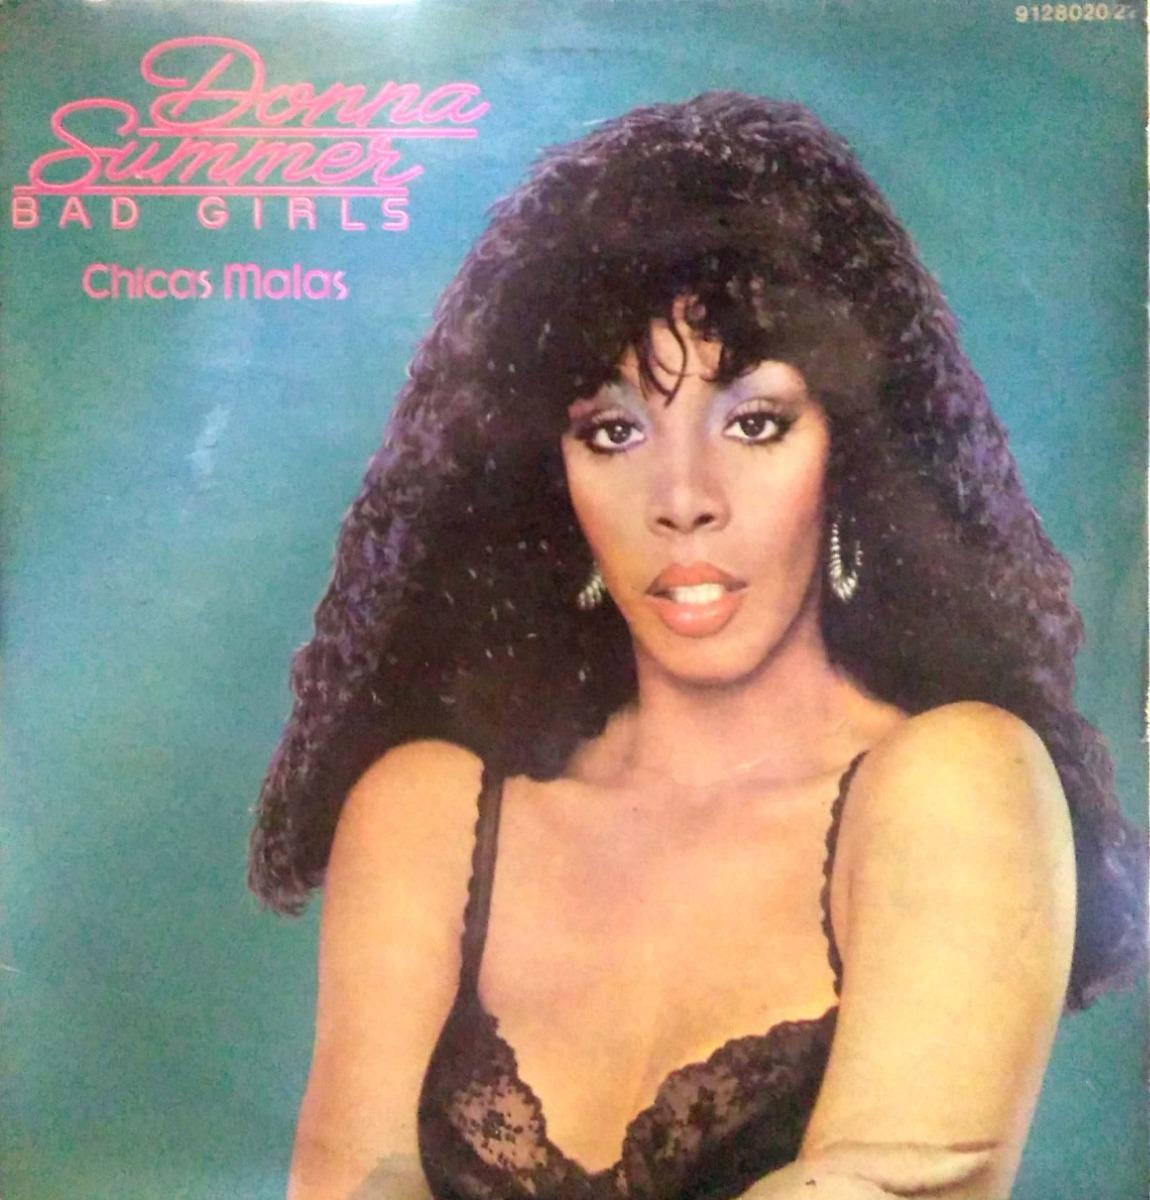 Vinilo Donna Summer Chicas Malas Nacional Dj Todelec 71500